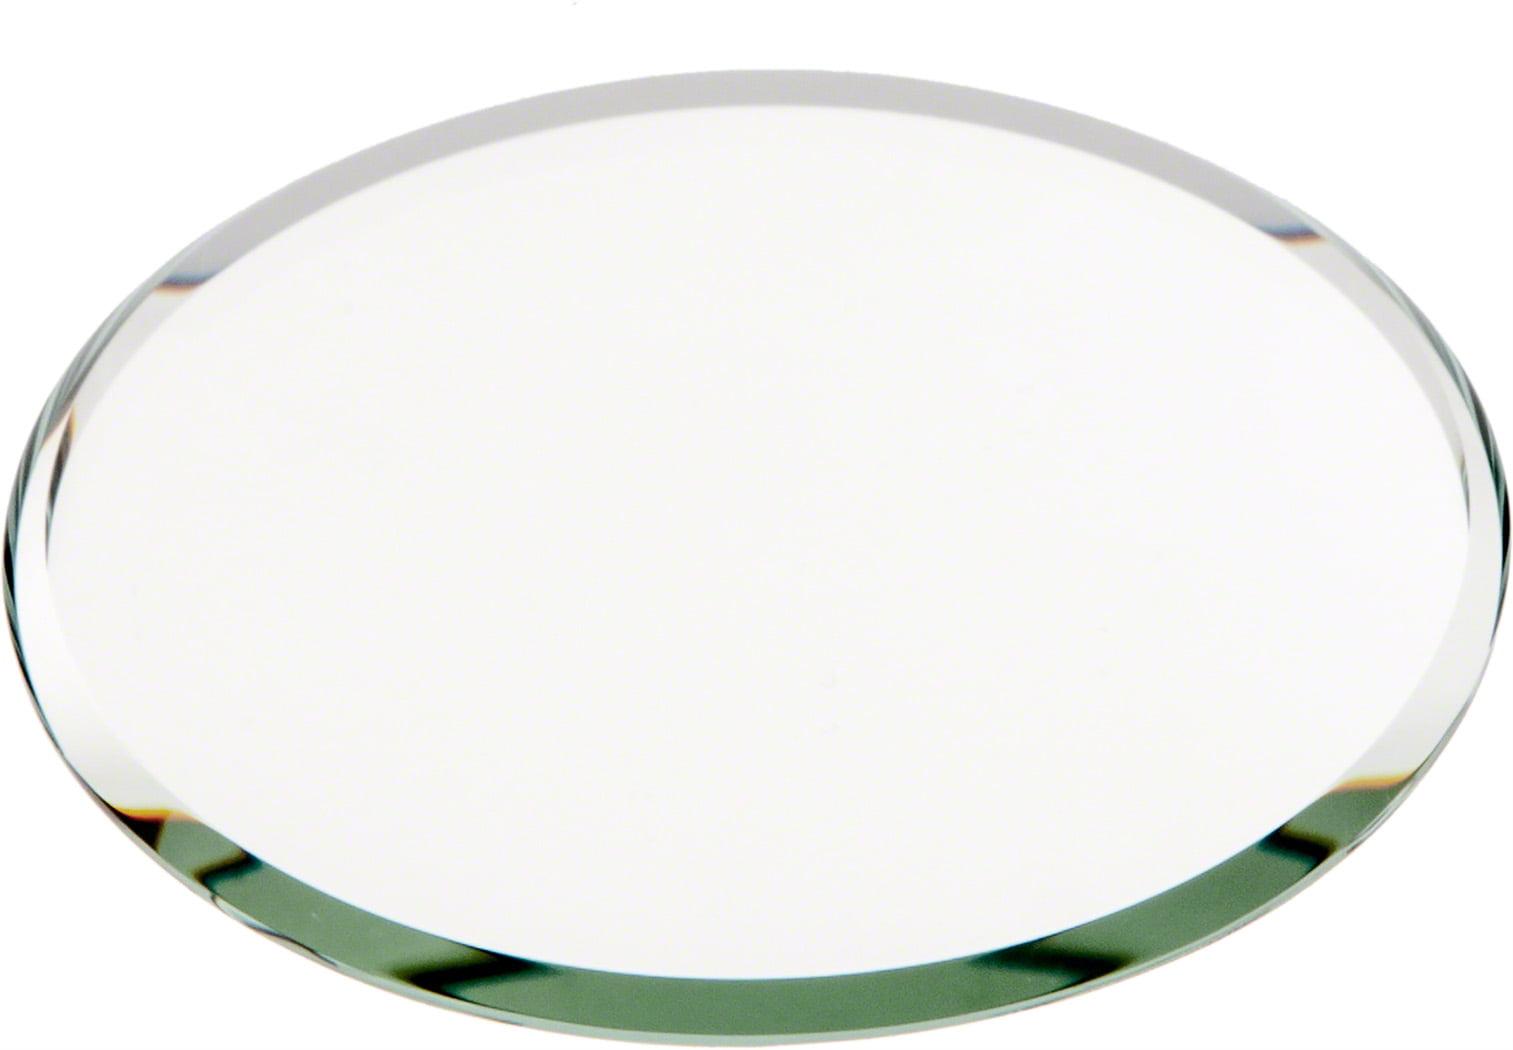 1 //12 scale dollhouse oval beveled glass miror 3/'/'x 5/'/'